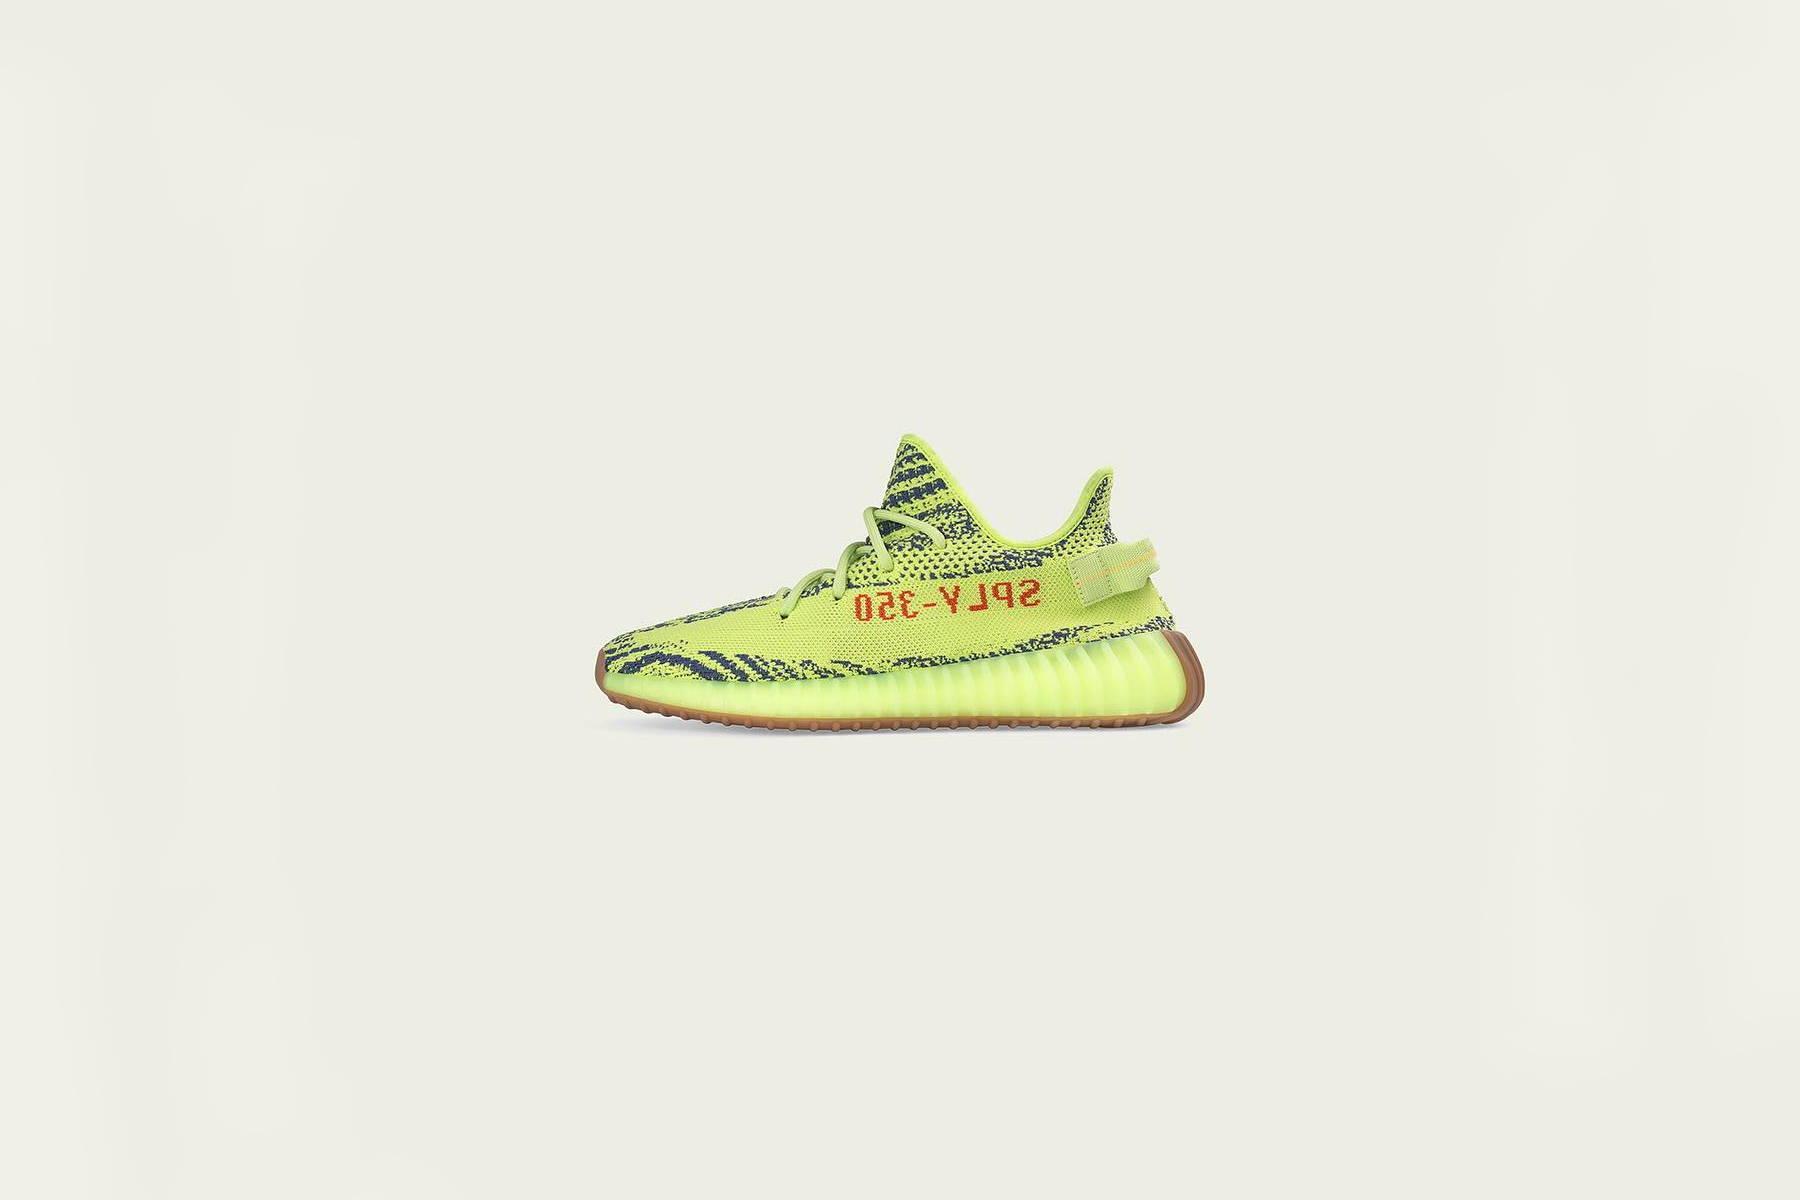 7983ee9869f Yeezy Boost 350 v2 Semi Frozen Yellow